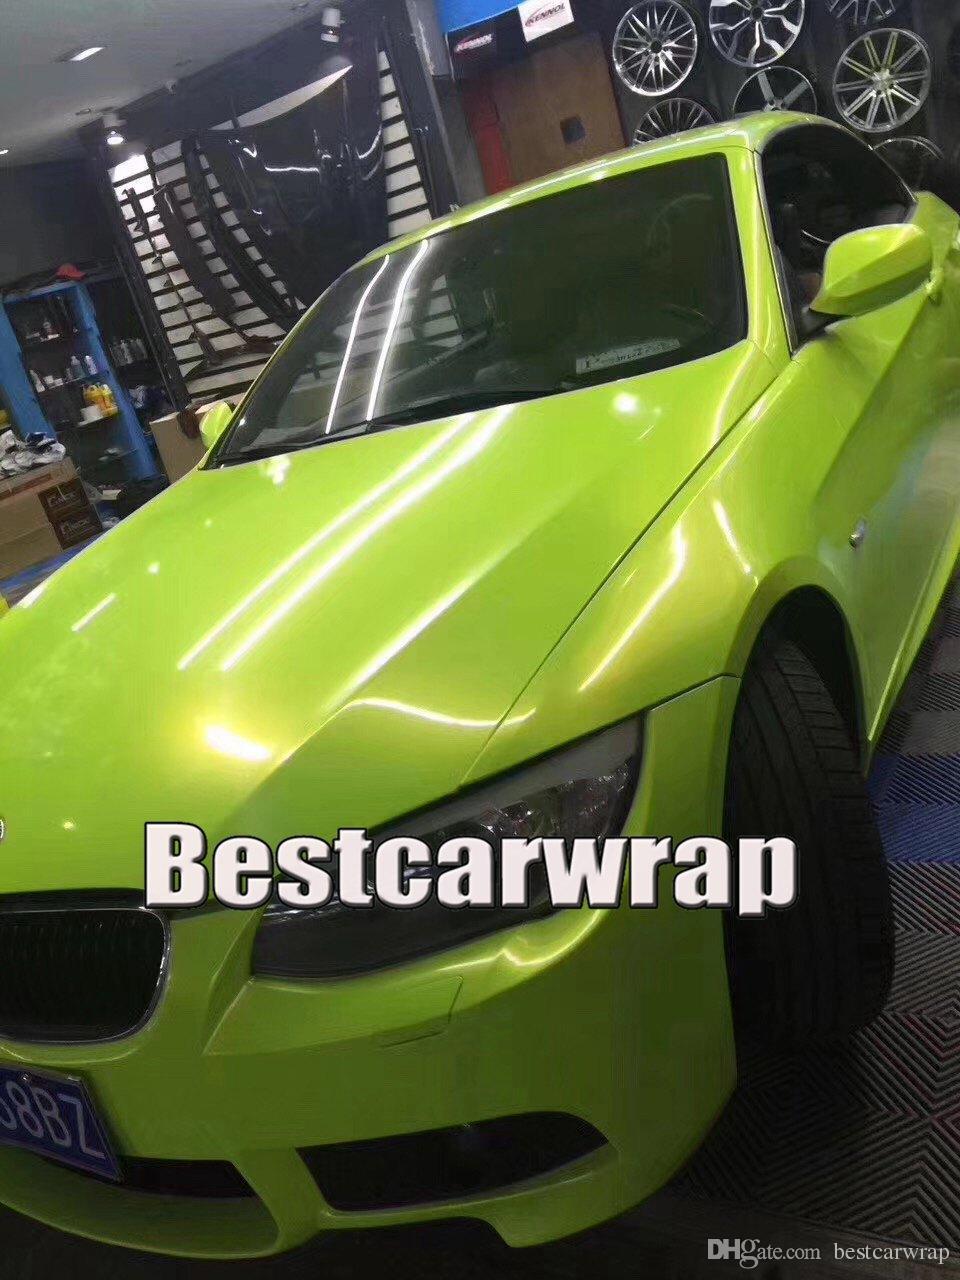 fluorescent lemon Gloss shift to gold metallic Vinyl Wrap For Car Wrap Film Magic glossy 1080 Union Covering foil Size:1.52*20m 5x67ft